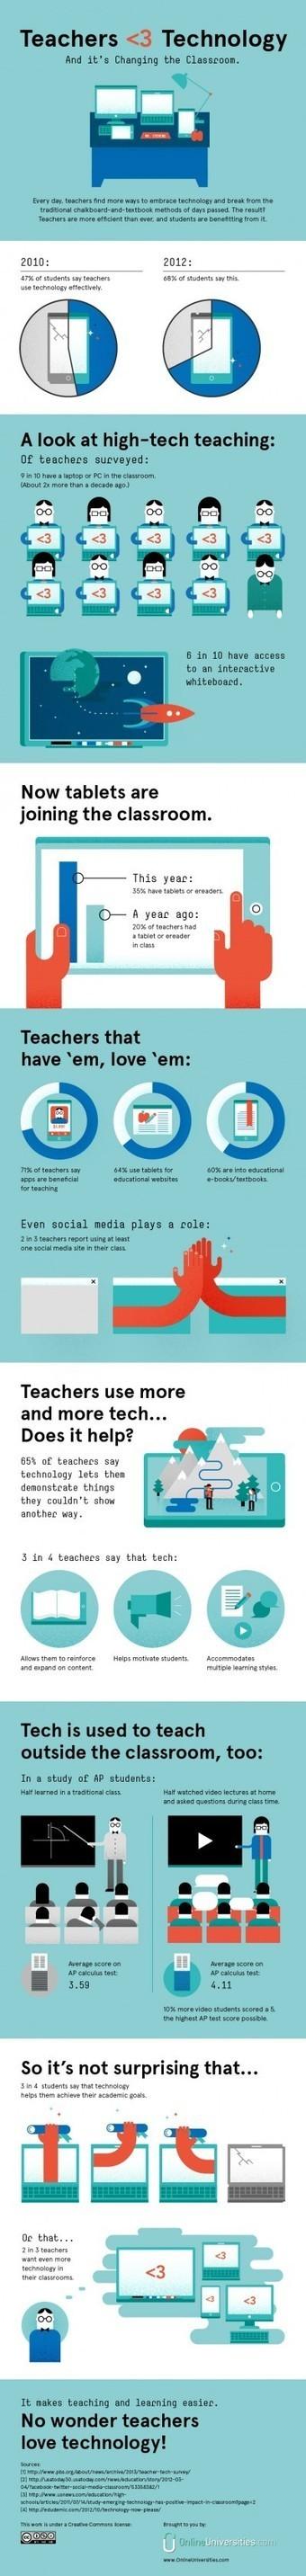 Teachers Love Technology Infographic | 21st Century Technology Integration | Scoop.it